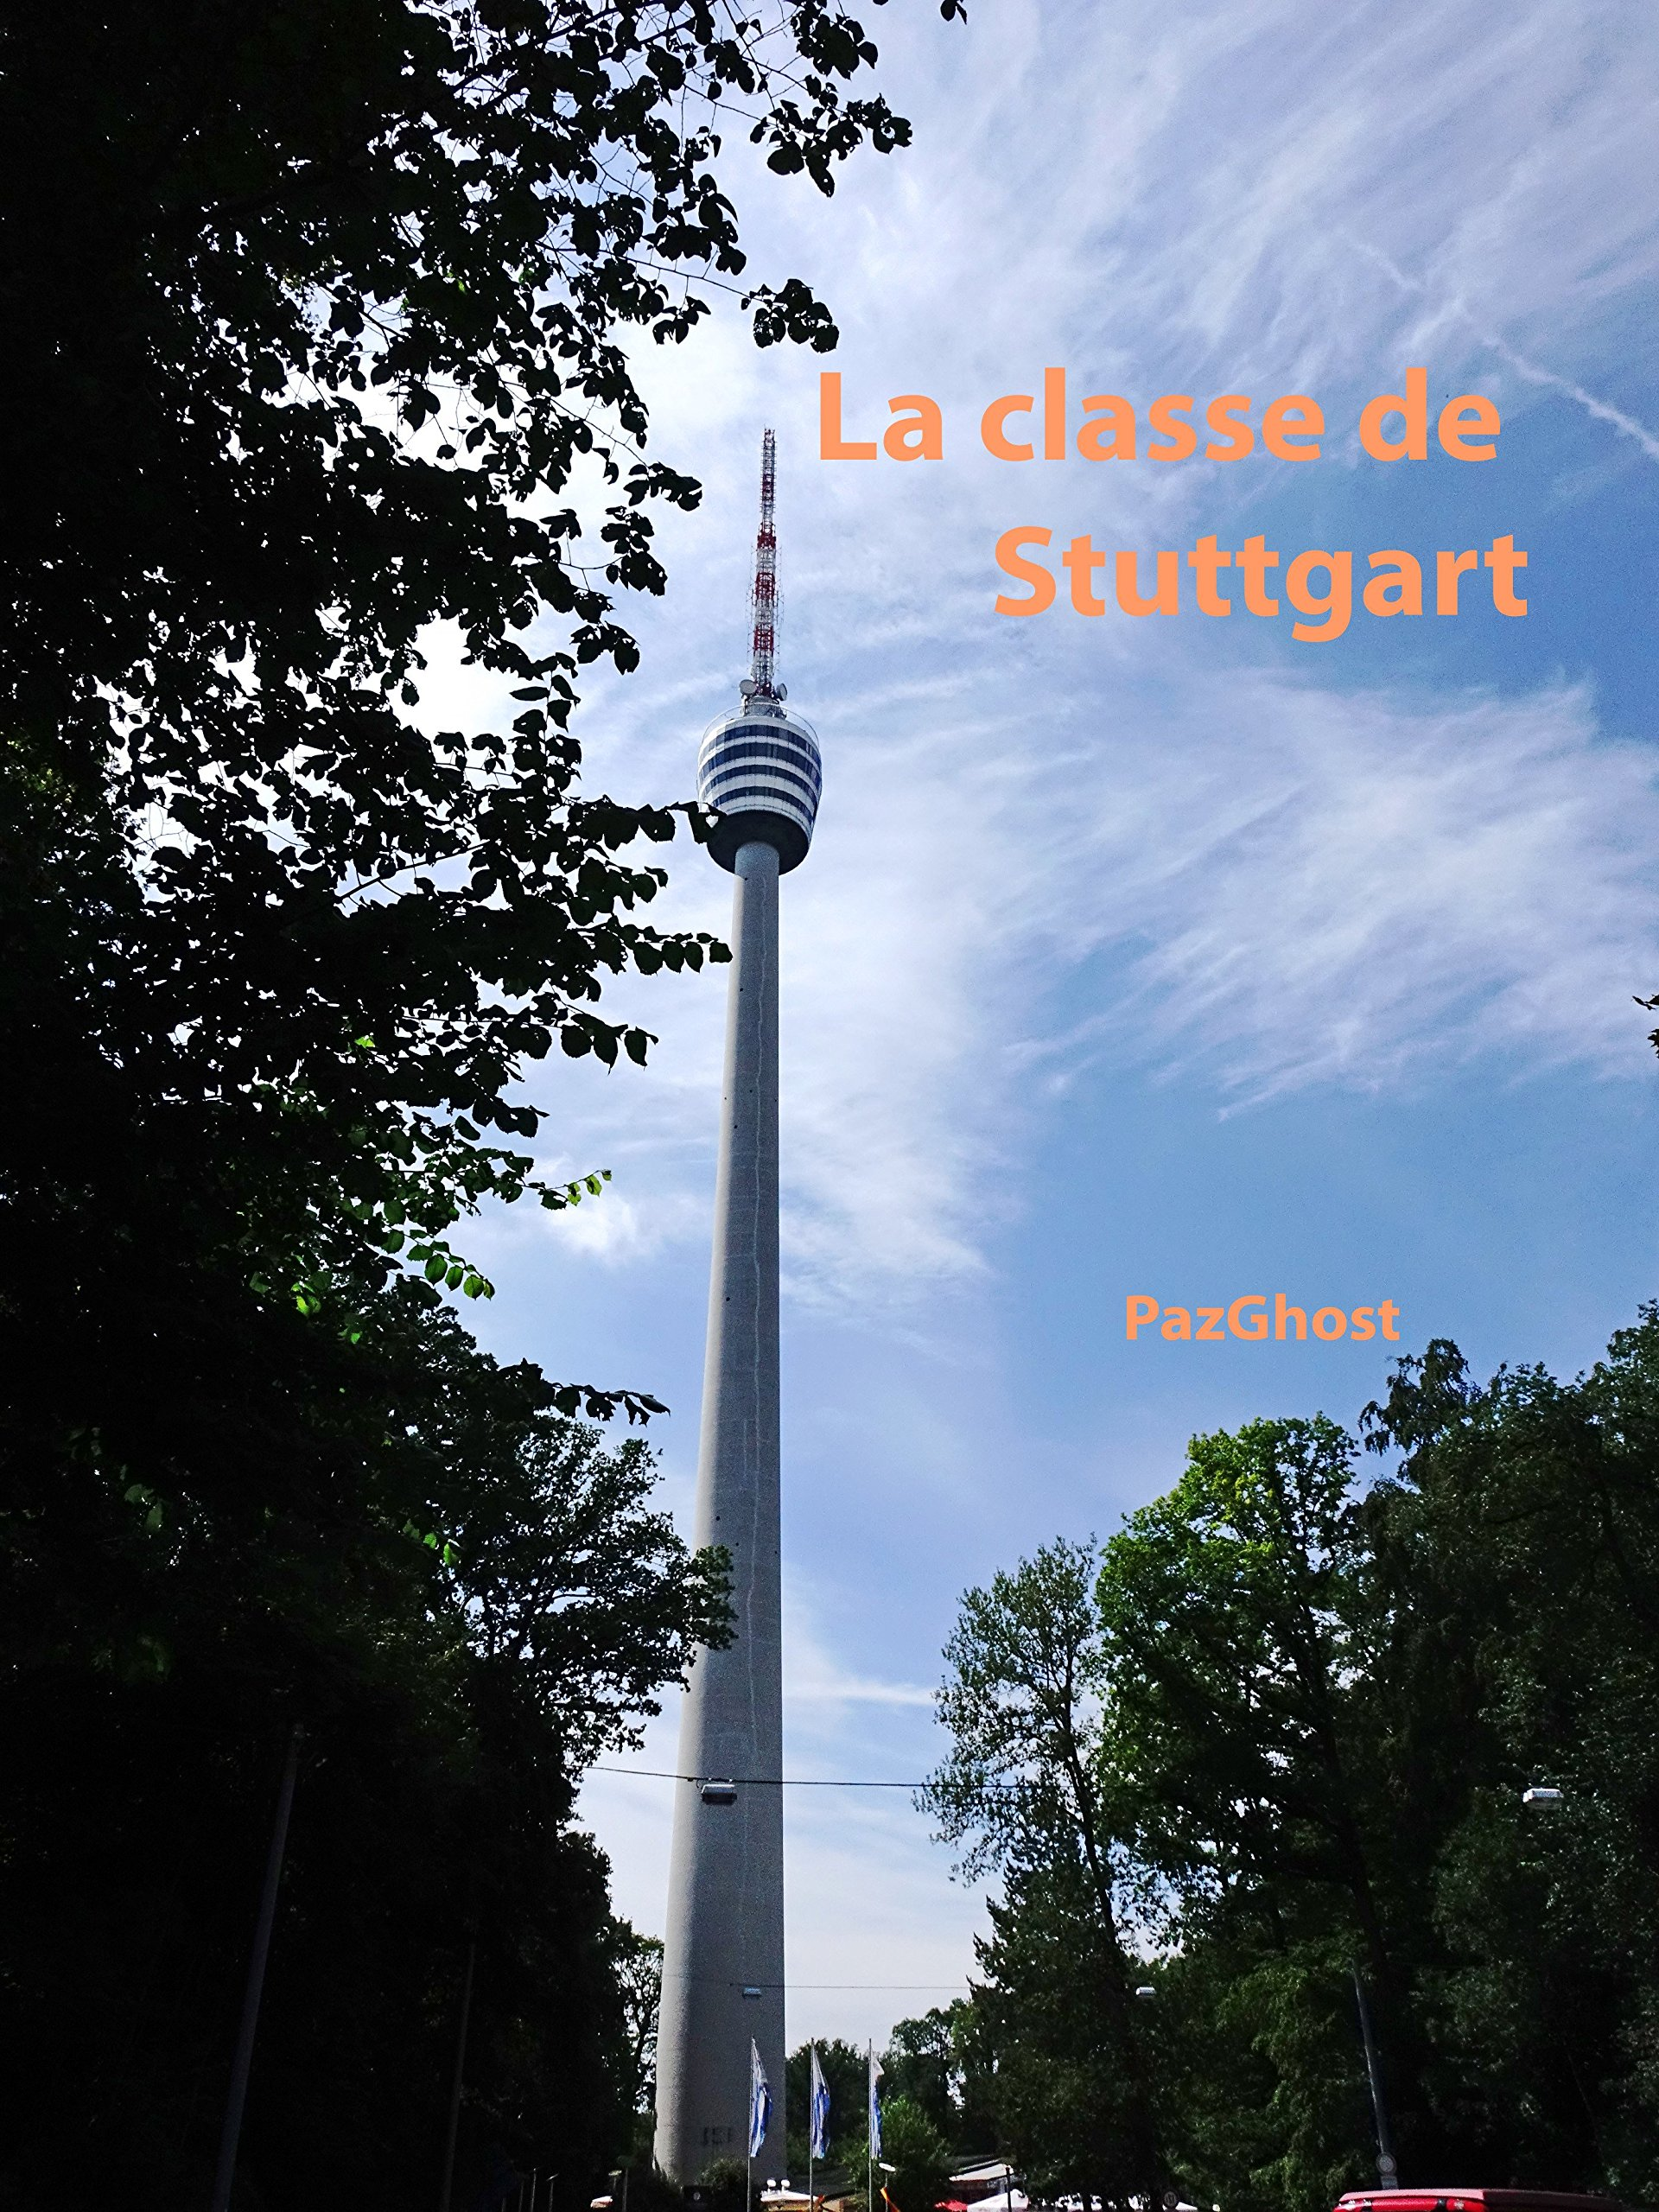 La classe de Stuttgart